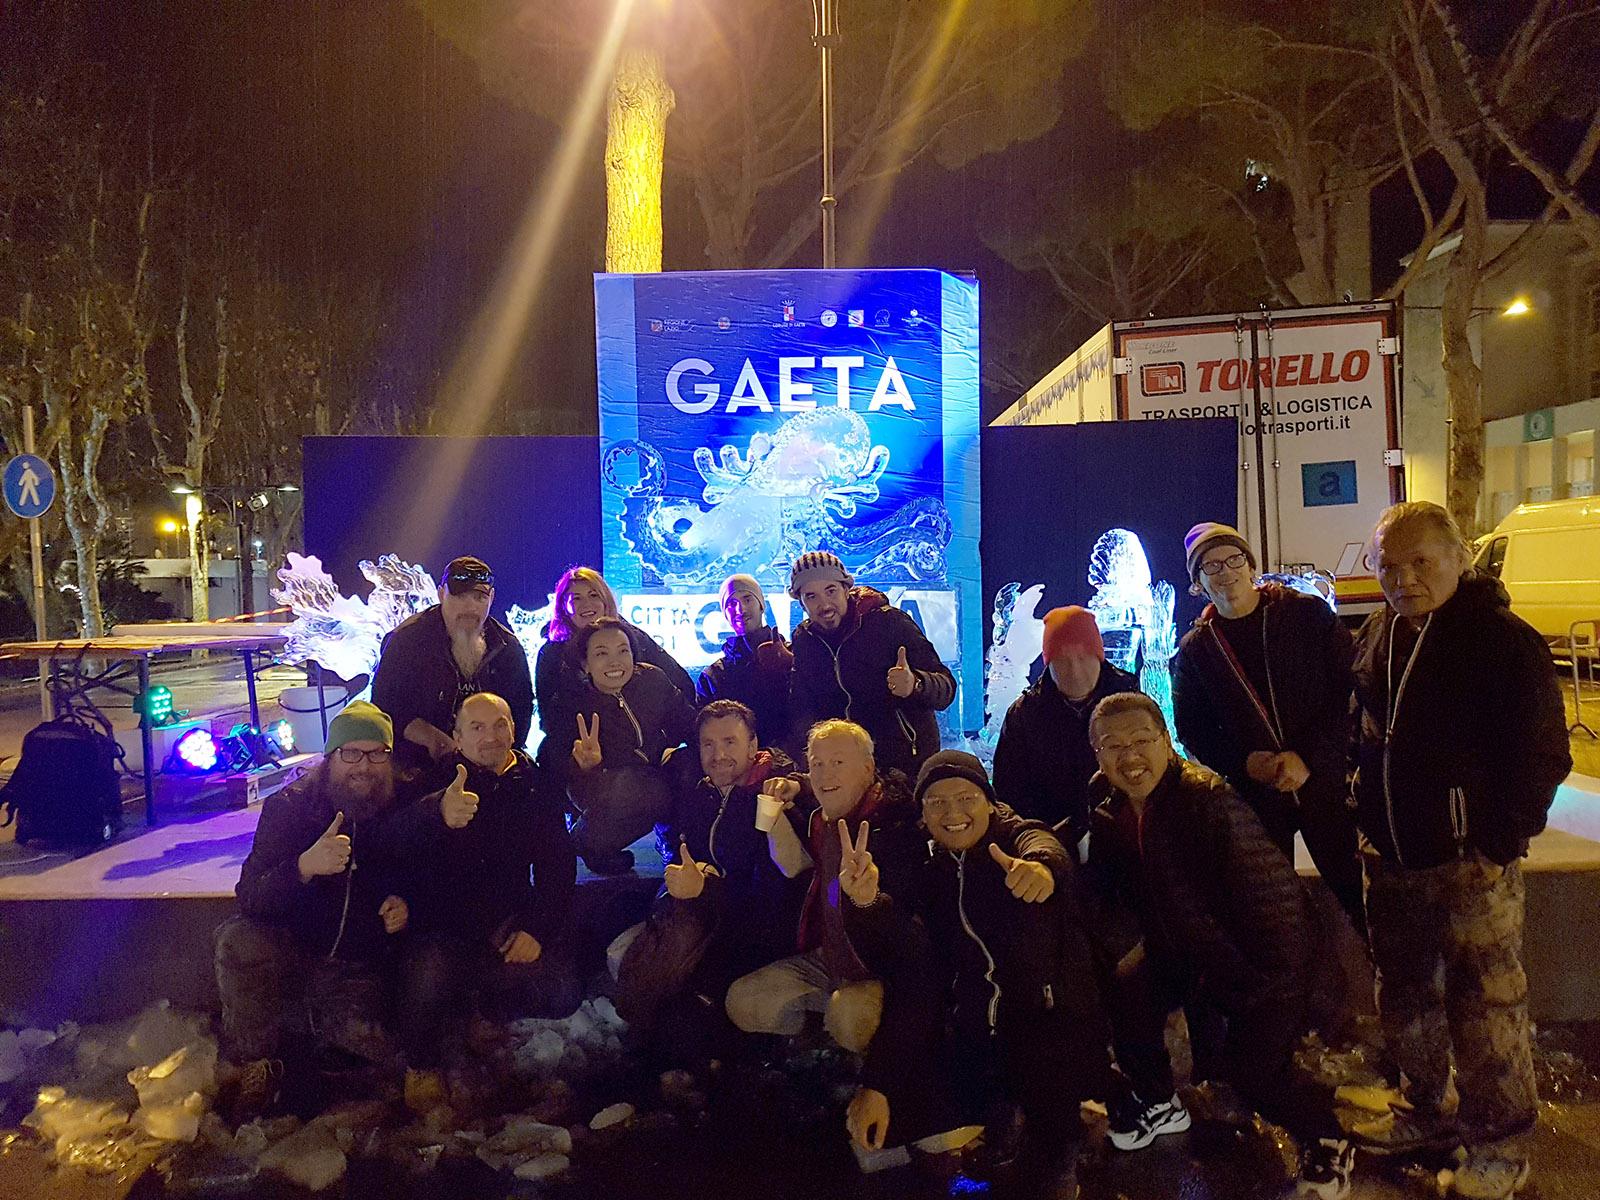 gaeta 2019 - Ghiaccio d'Arte